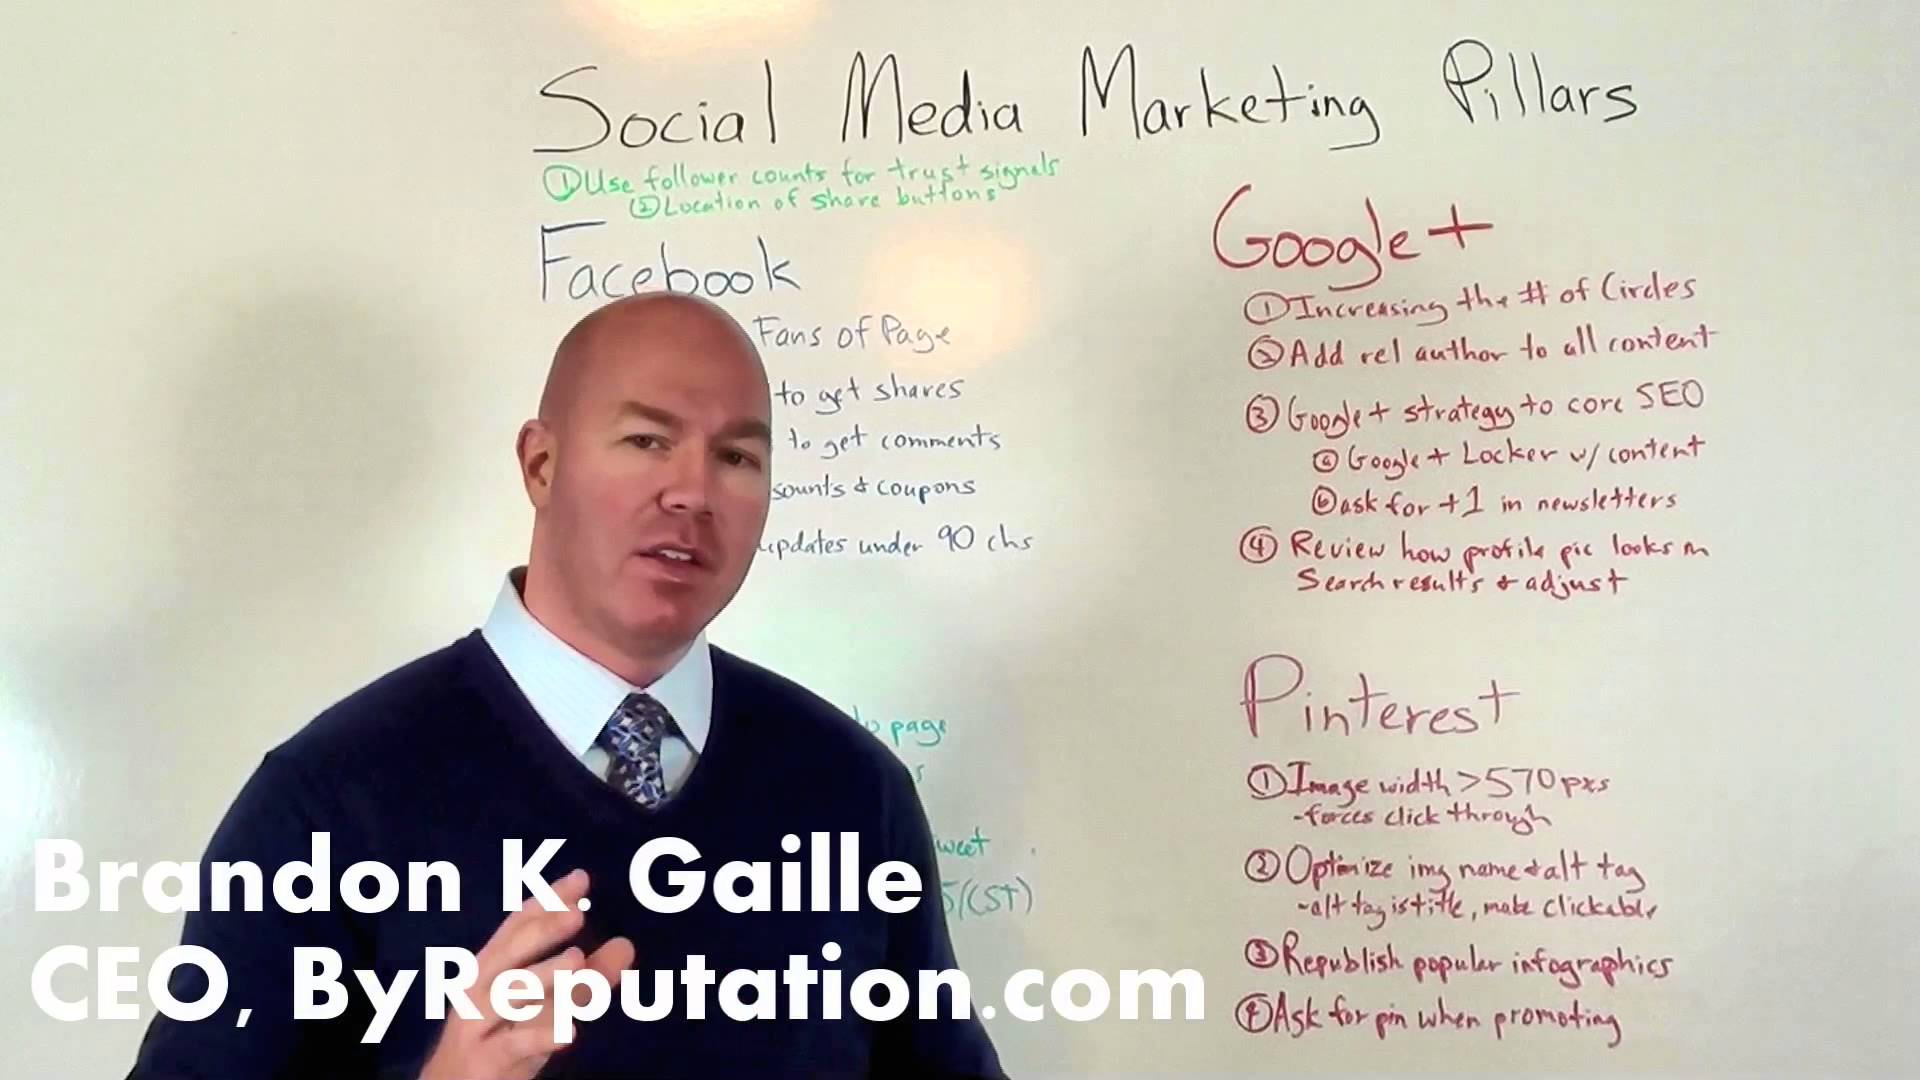 Social Media Marketing Video Tutorial And Guide